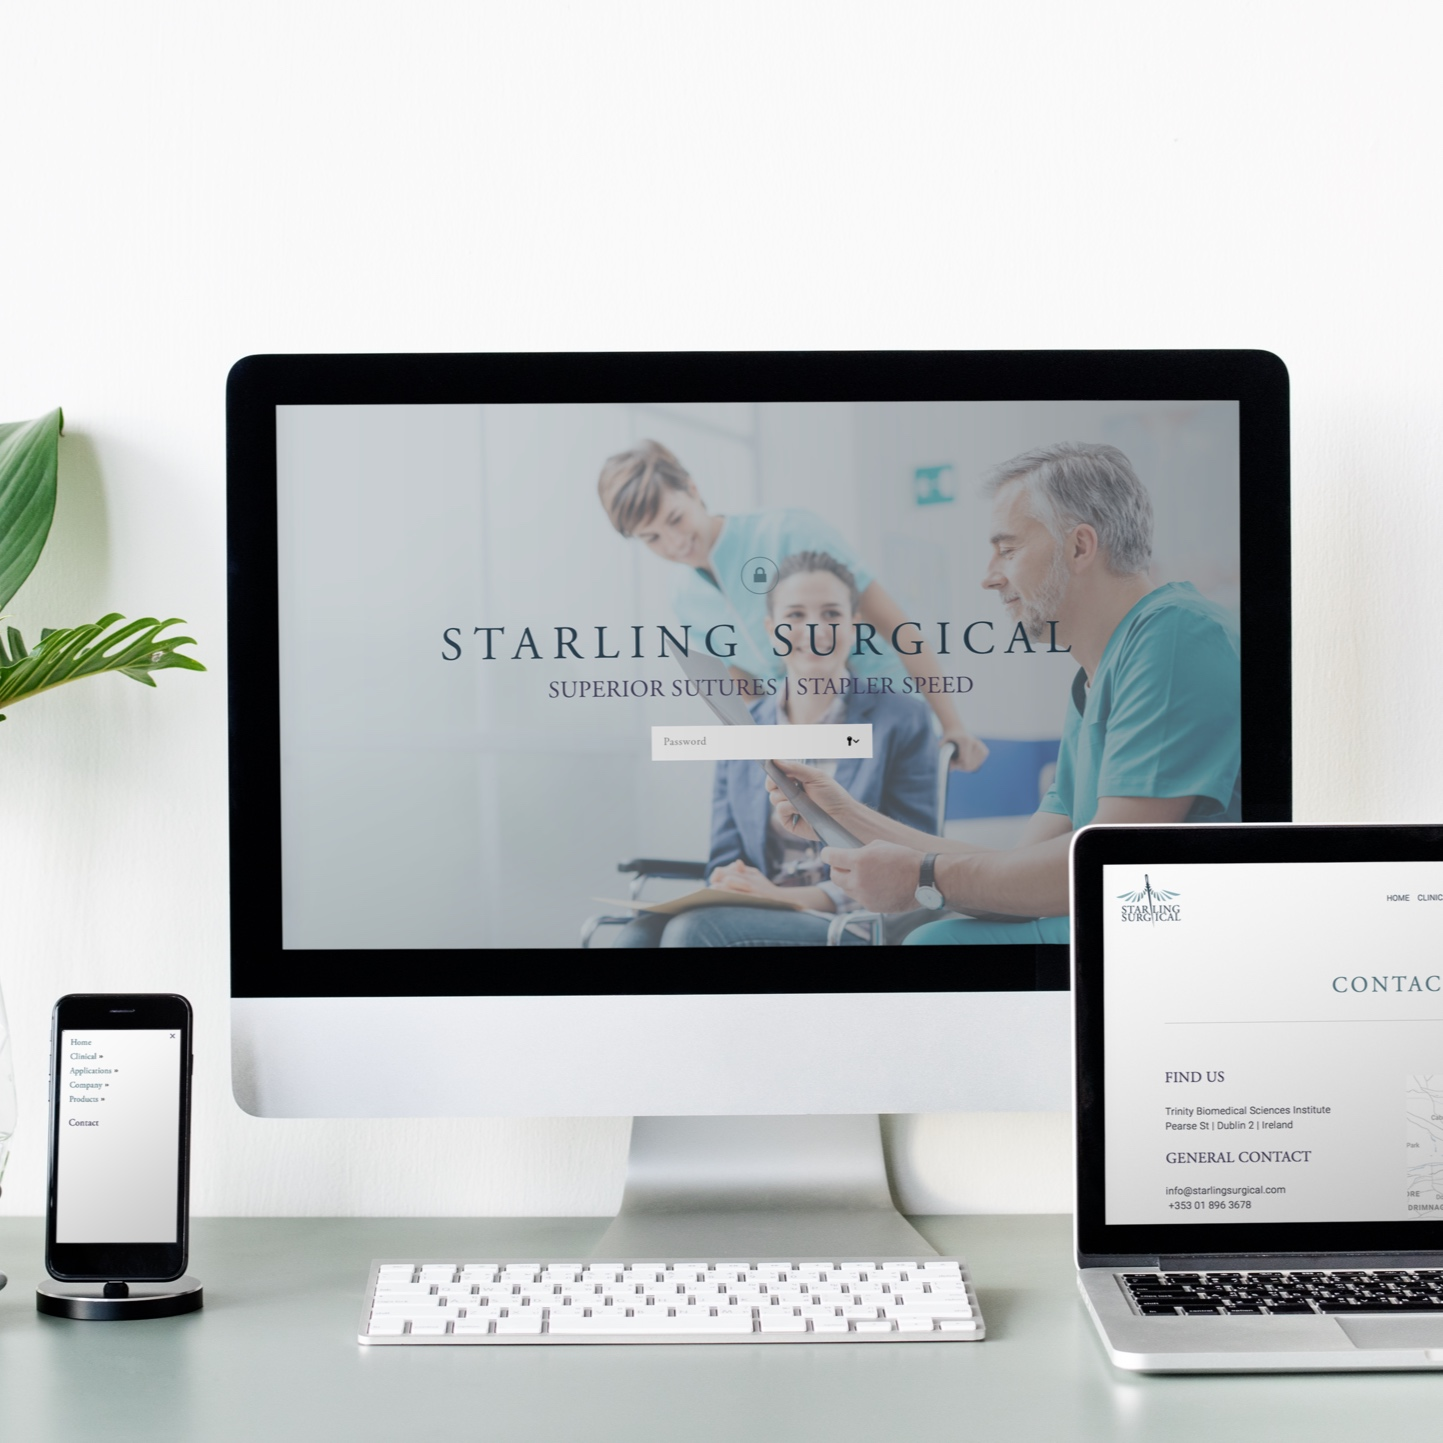 DavisD4 | Starling Surgical